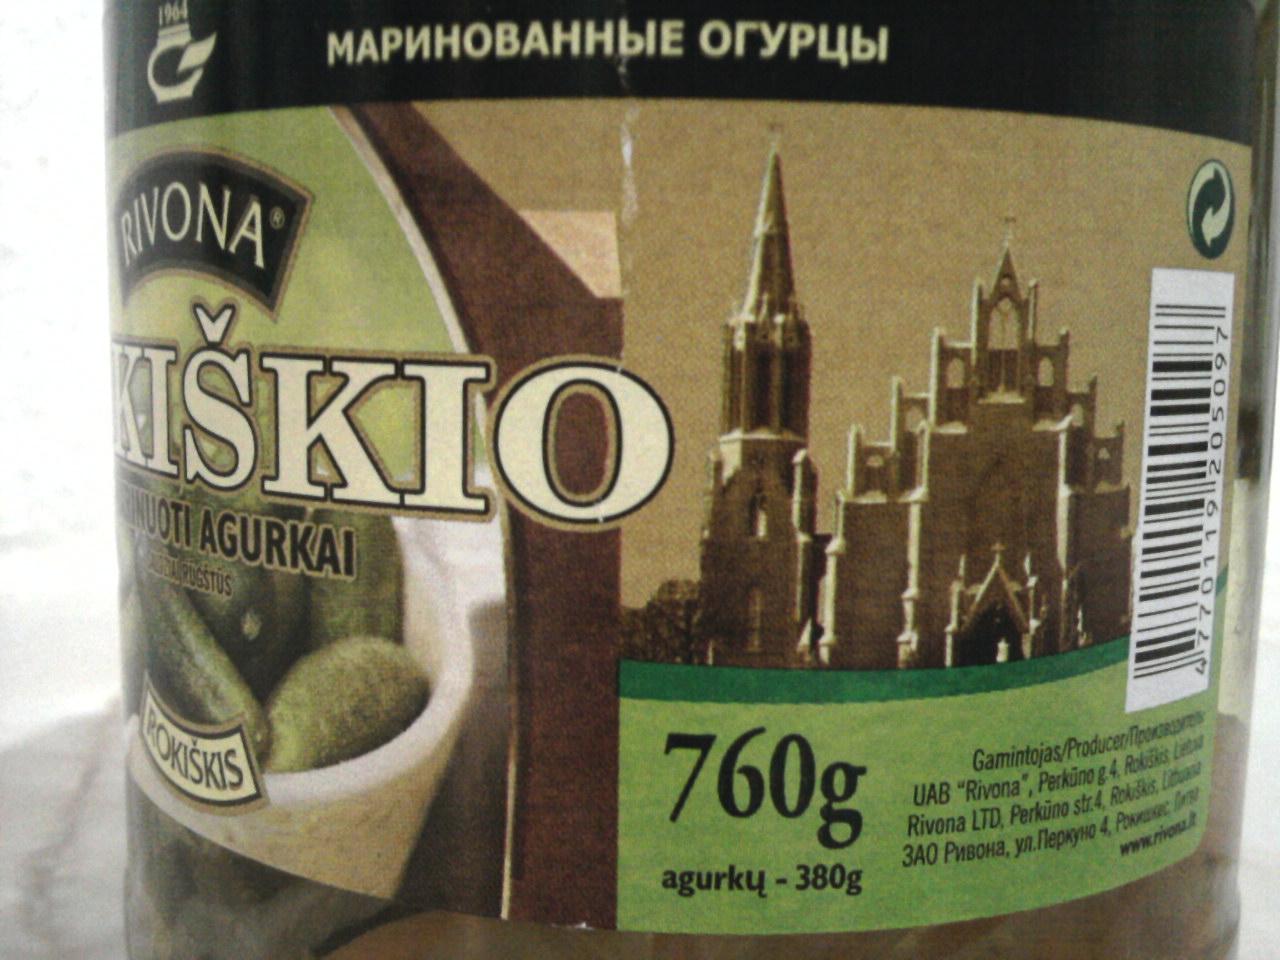 Rivona Rokiškio Marinuoti Agurkai Pickled Cucumbers barcode side of label